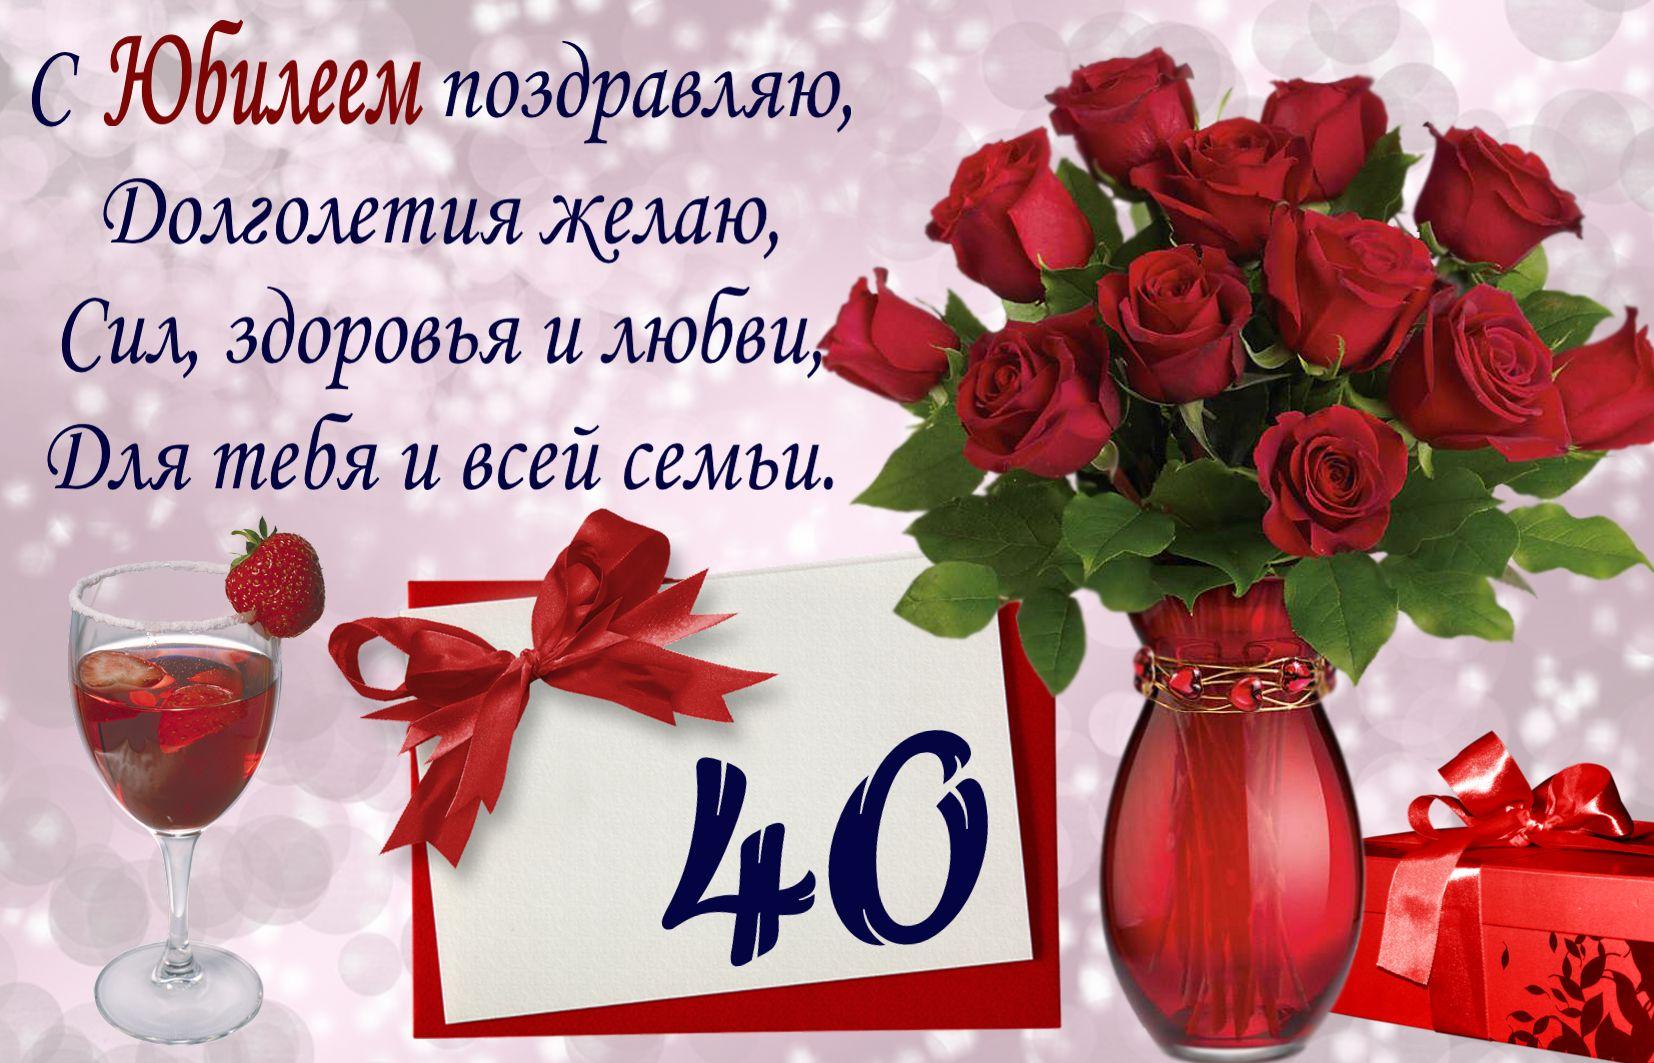 Поздравление дочери на юбилей 45